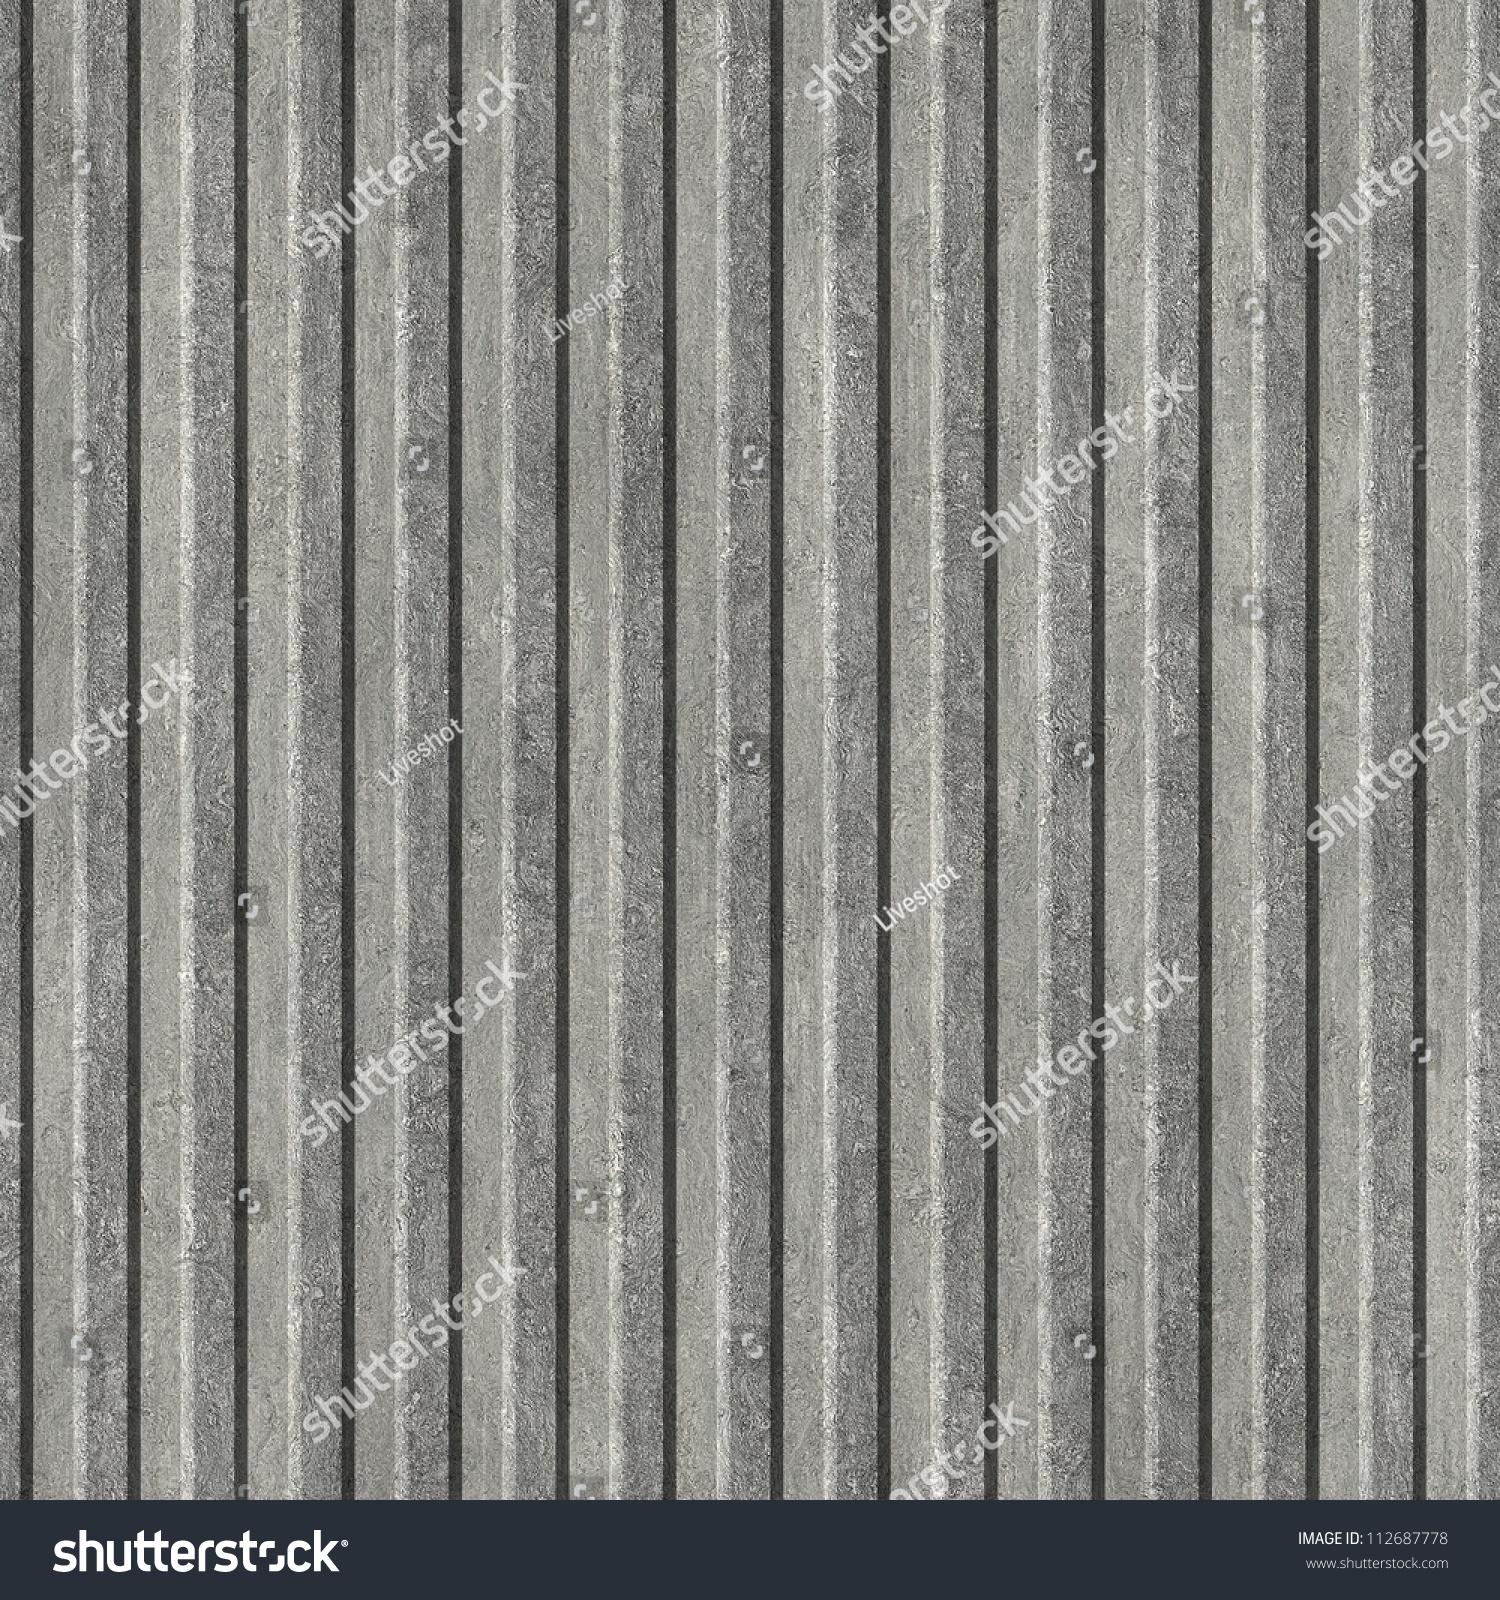 Corrugated metal  Seamless texture. Corrugated Metal  Seamless Texture  Stock Photo 112687778